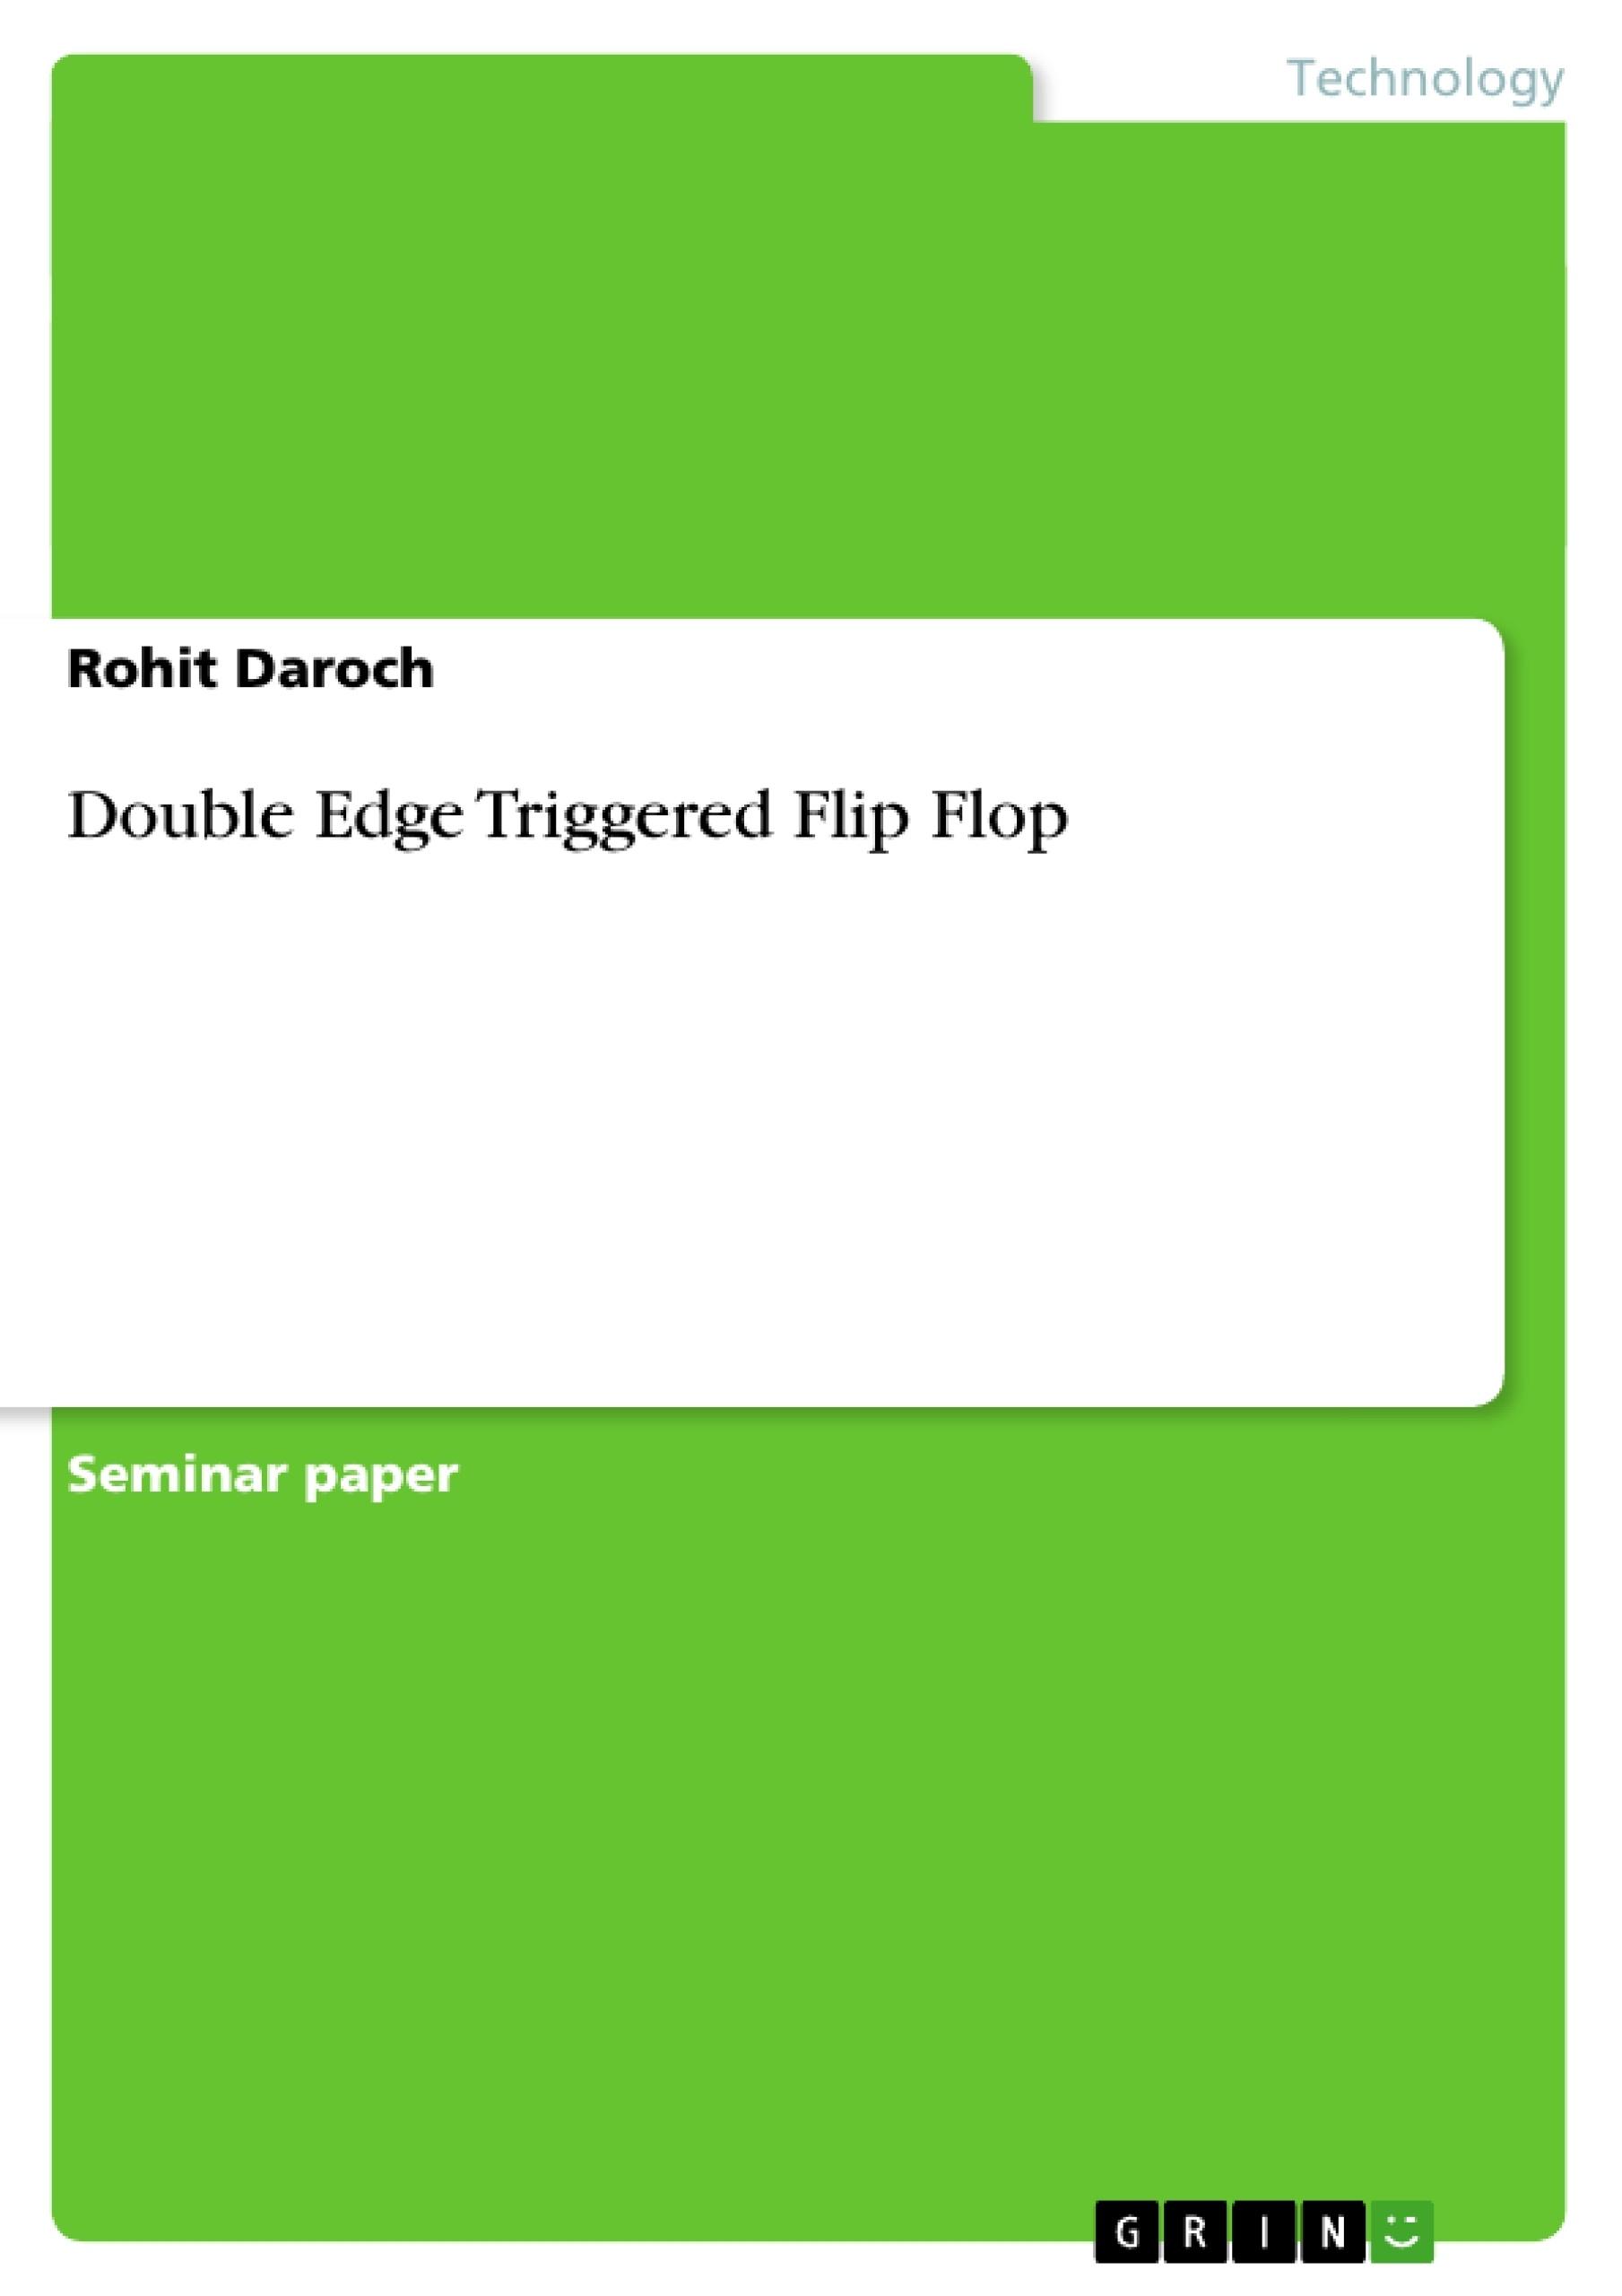 Title: Double Edge Triggered Flip Flop